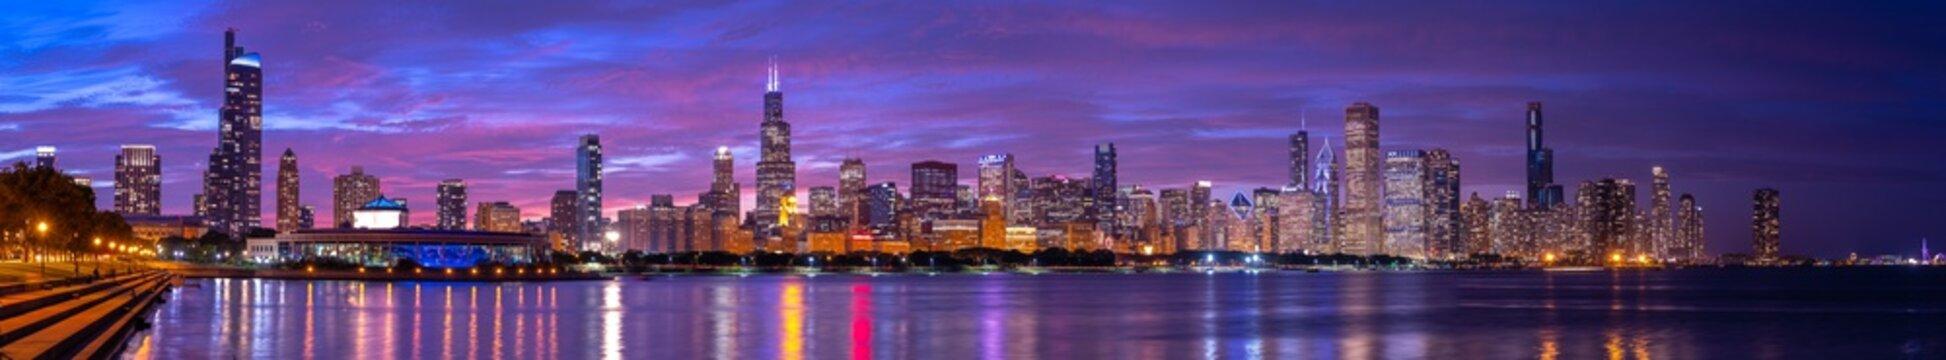 Chicago downtown buildings skyline evening sunset dusk